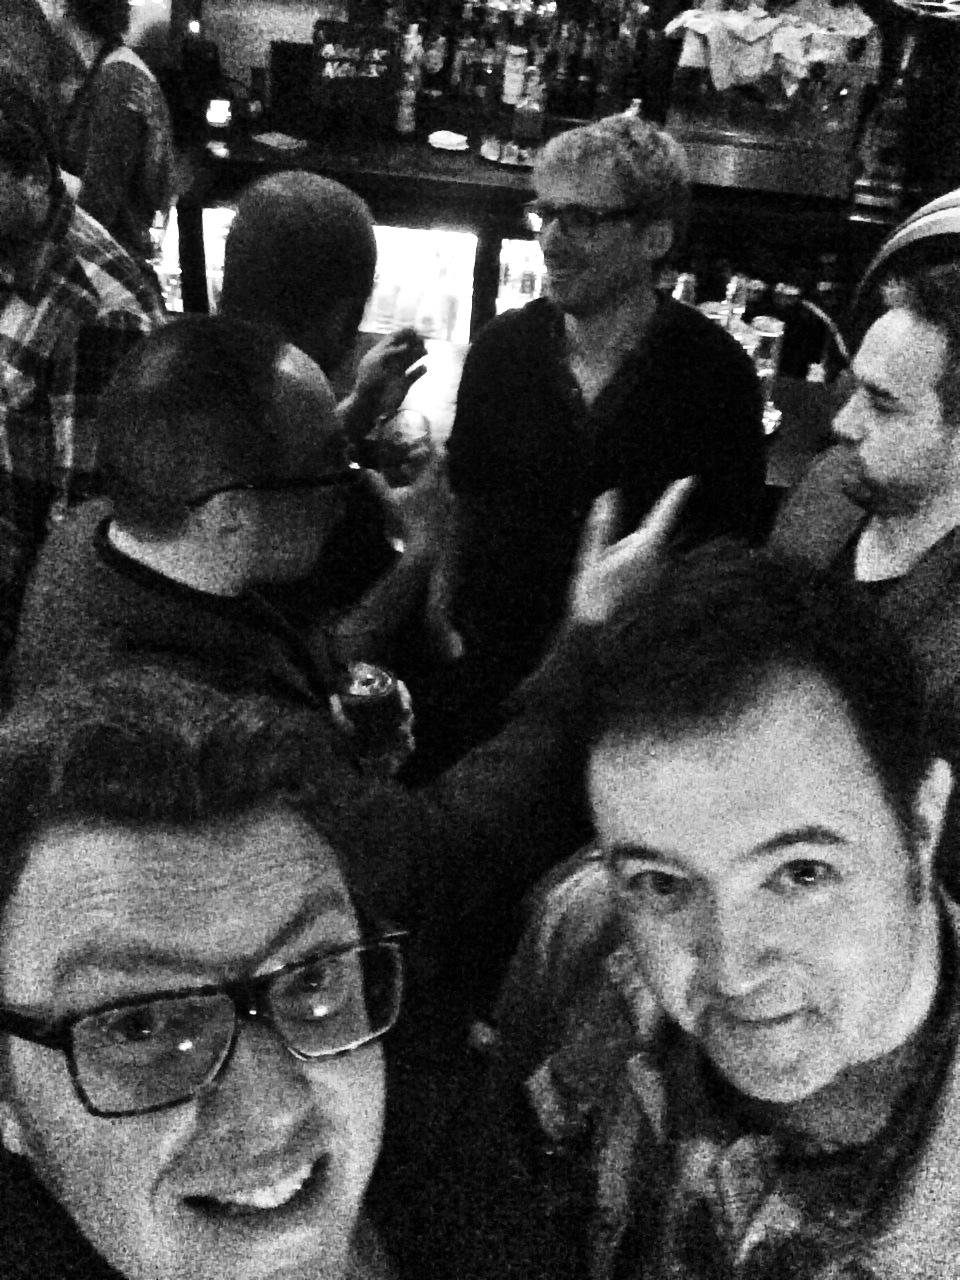 Niall Acott and Matt Shearer - selfie, with David Walter in the background, plus Dan McCabe, Tarkan Algin, Dean Gardner